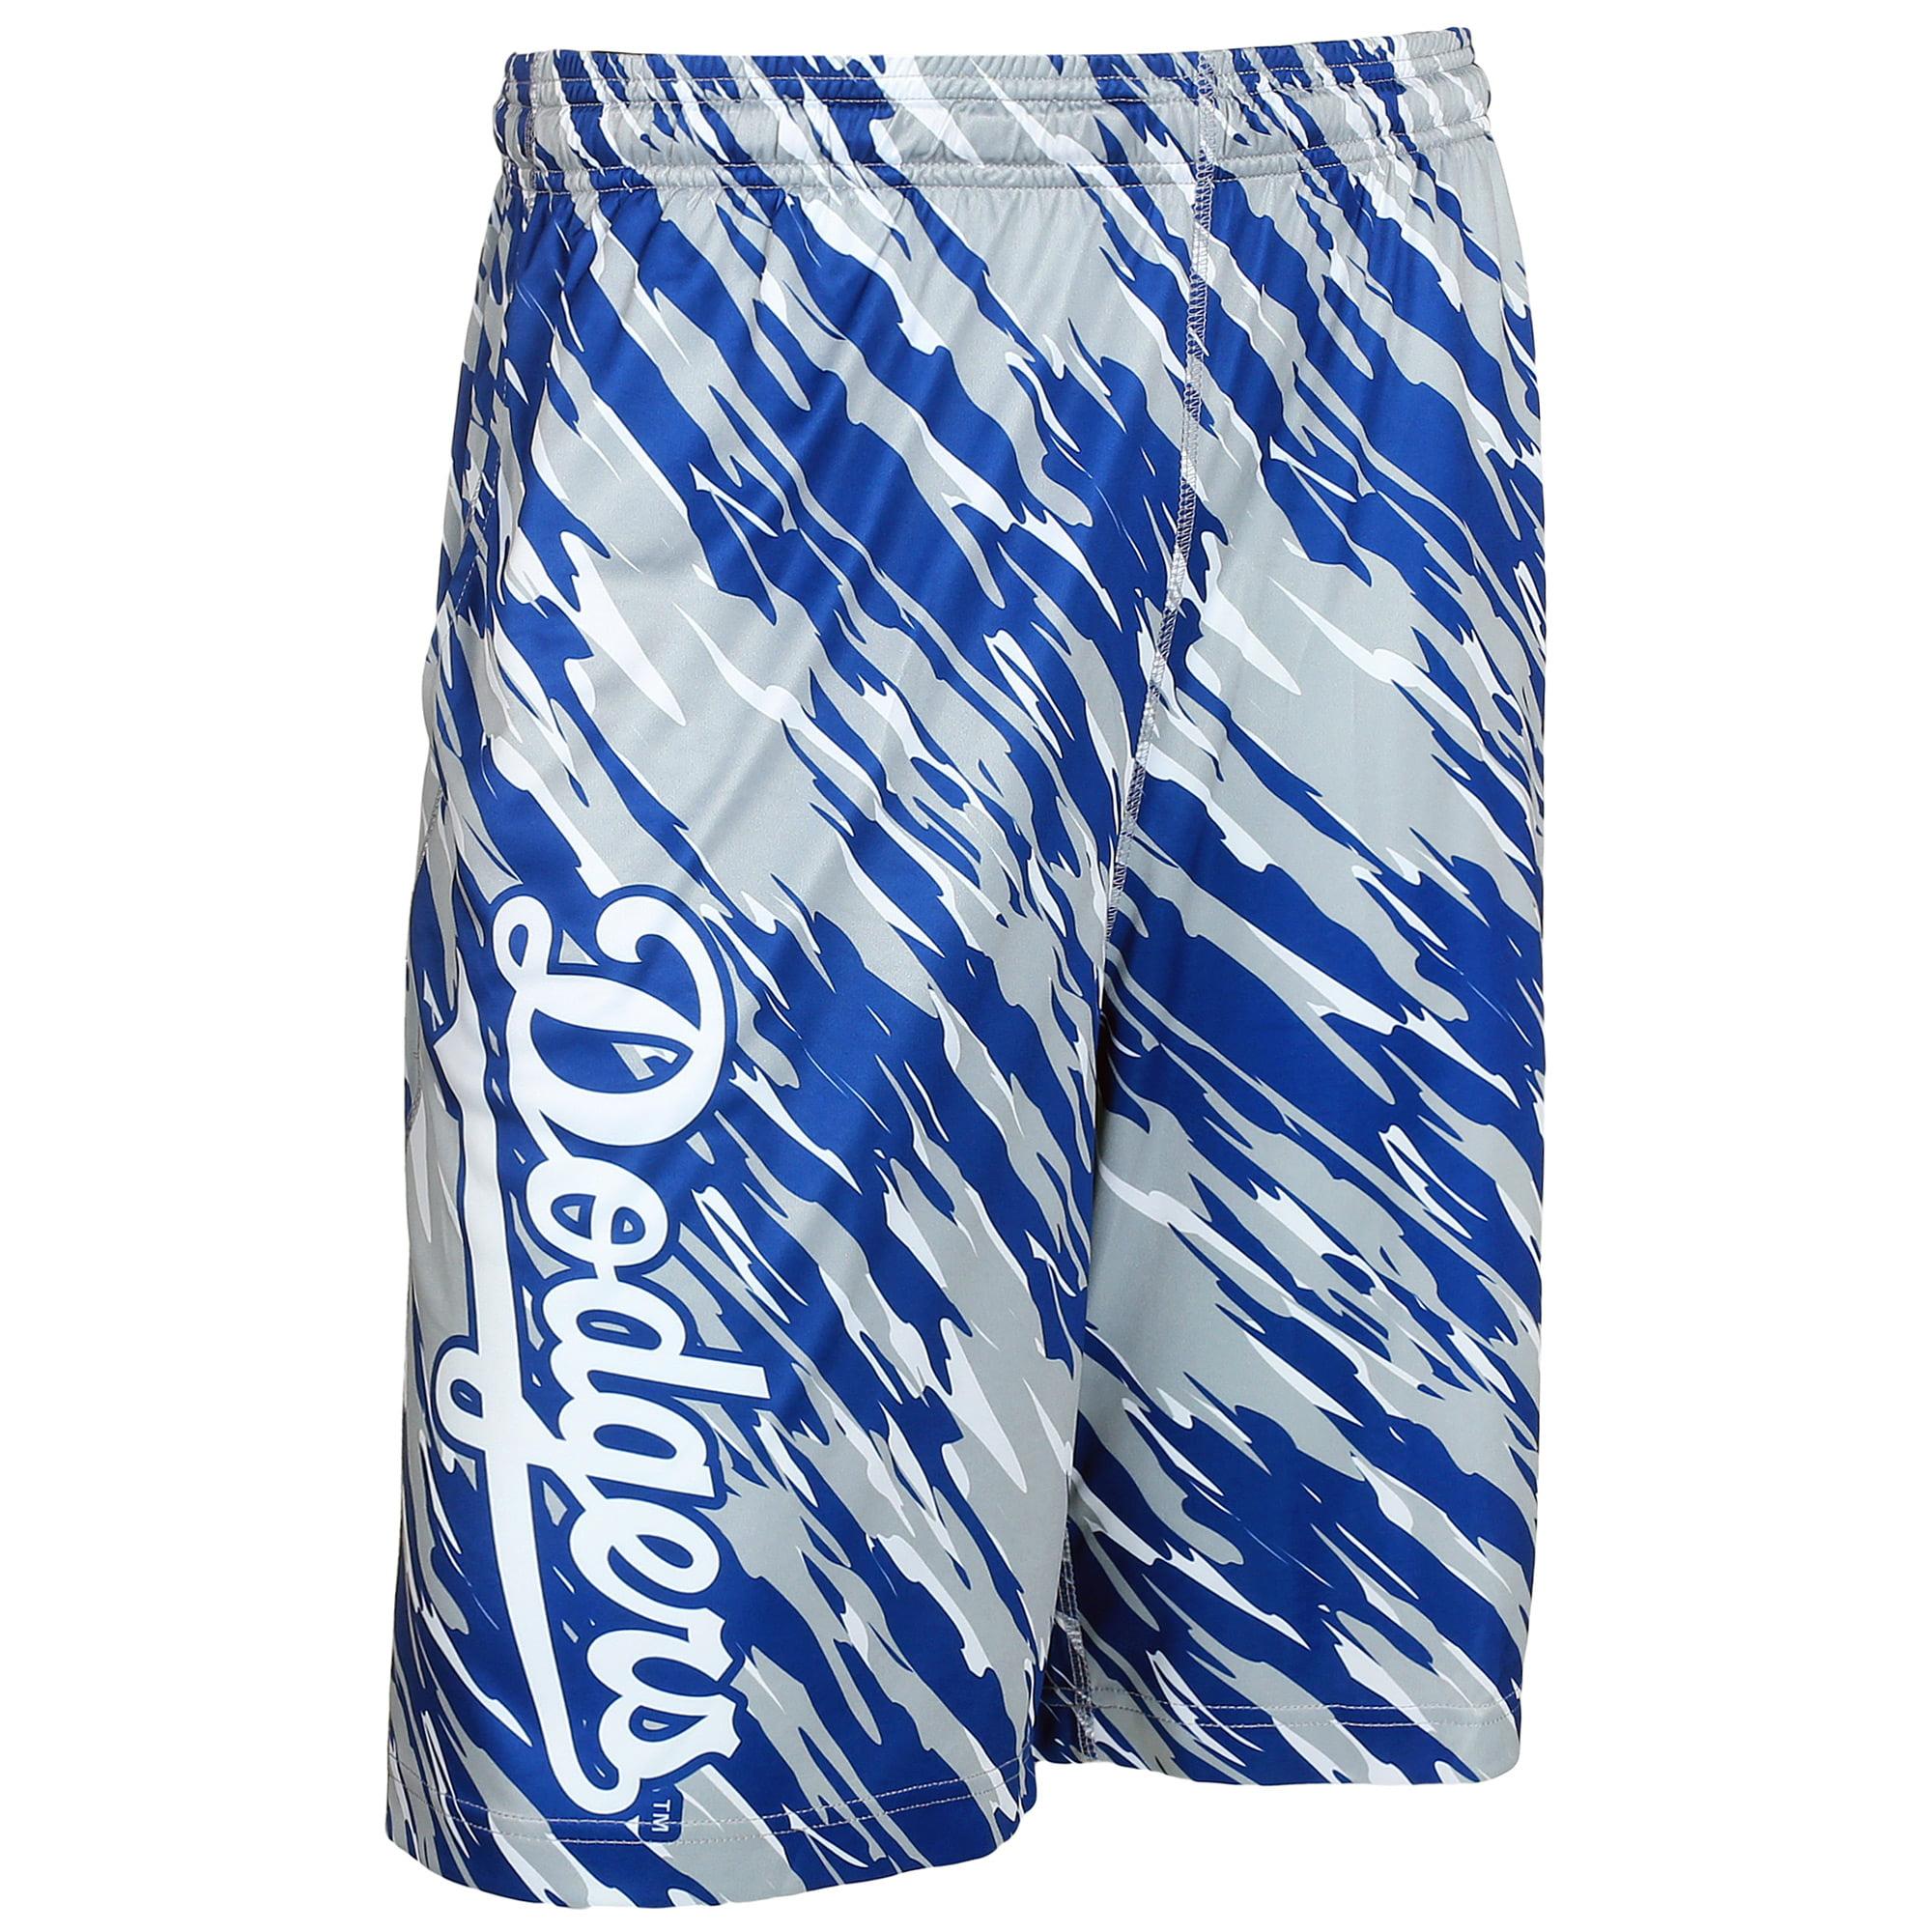 Los Angeles Dodgers Repeat Print Shorts - Royal/White